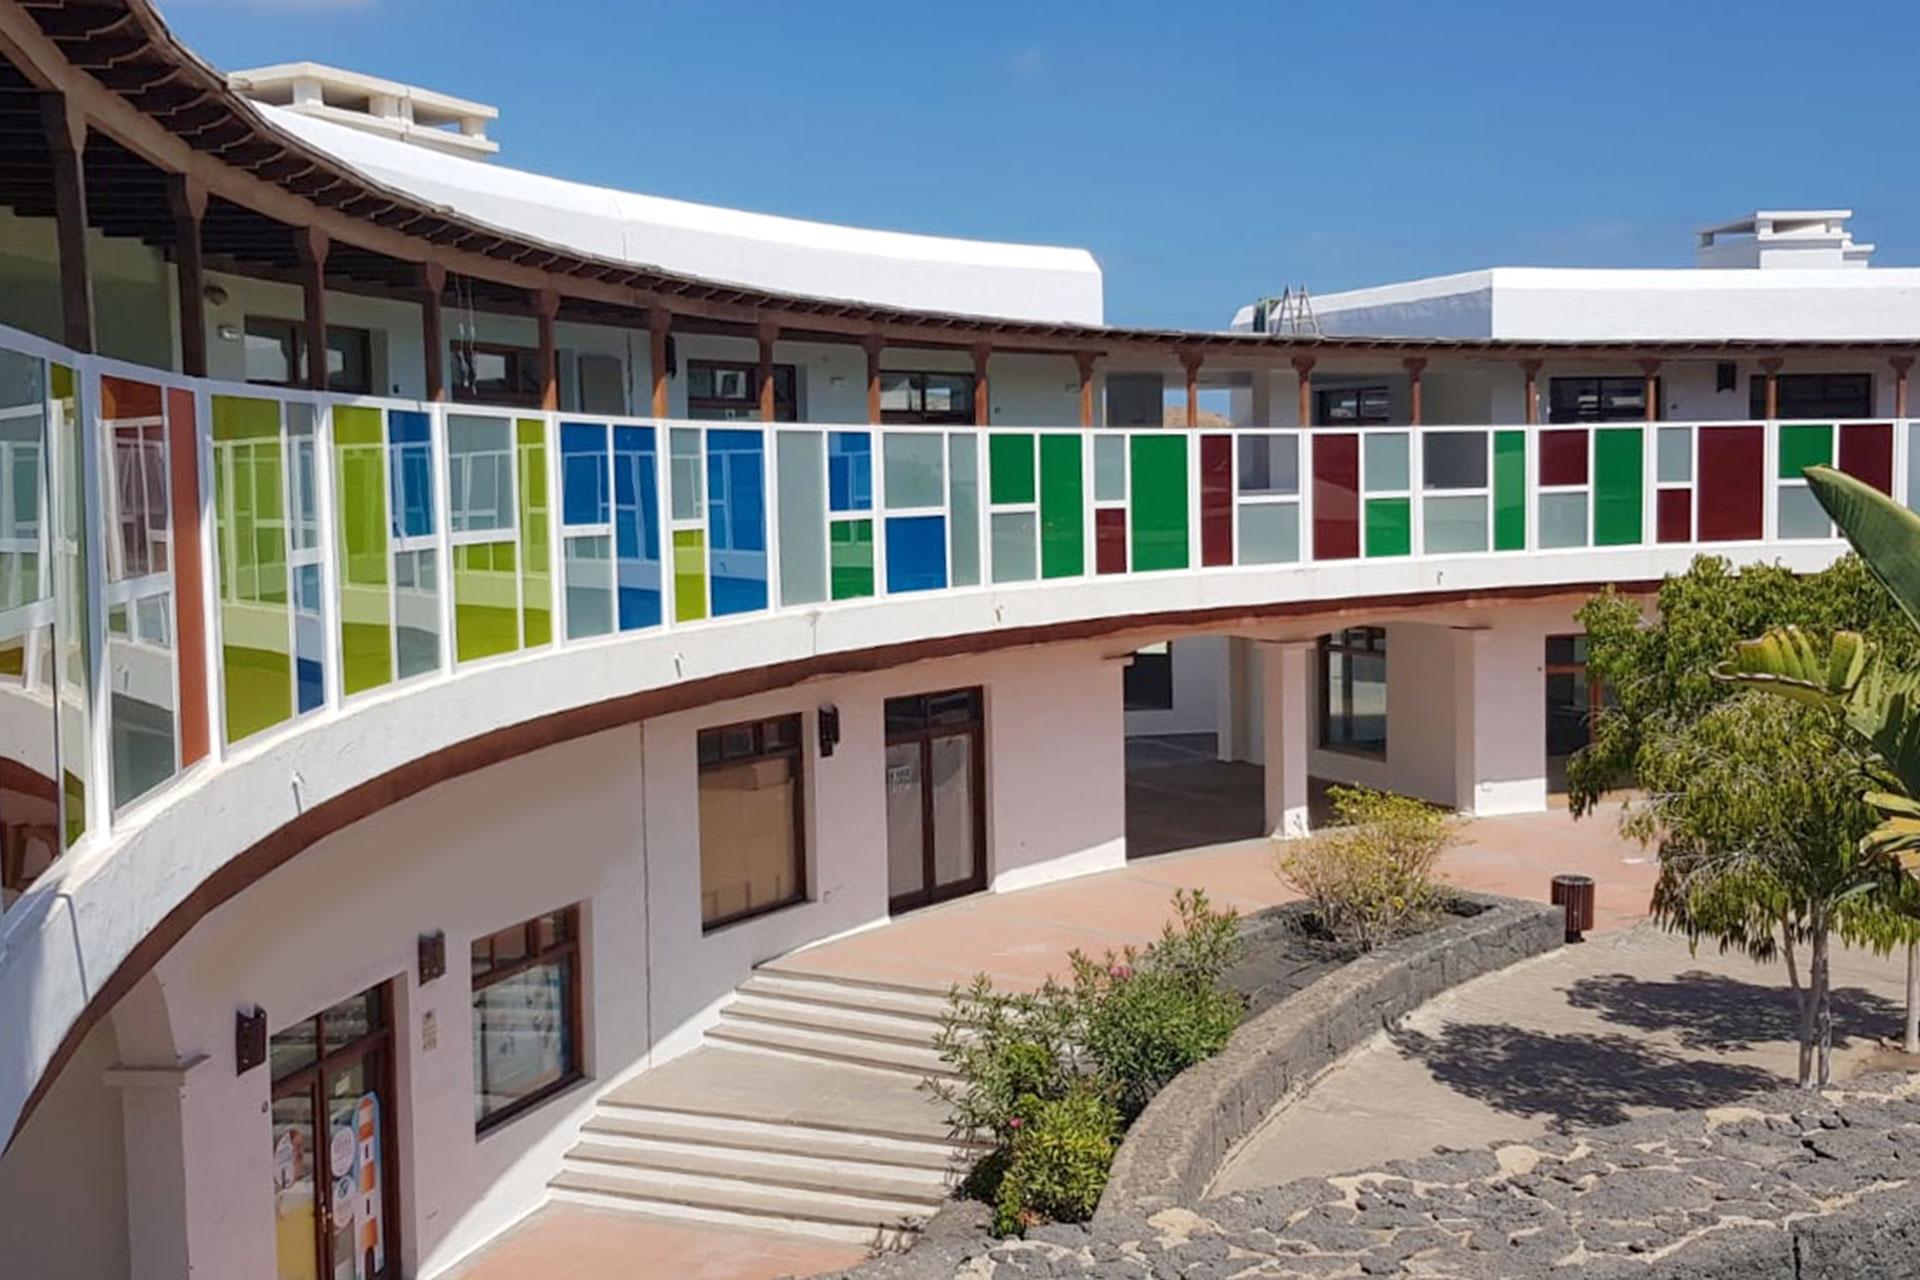 Colegio Arenas Nursery School Playa Blanca